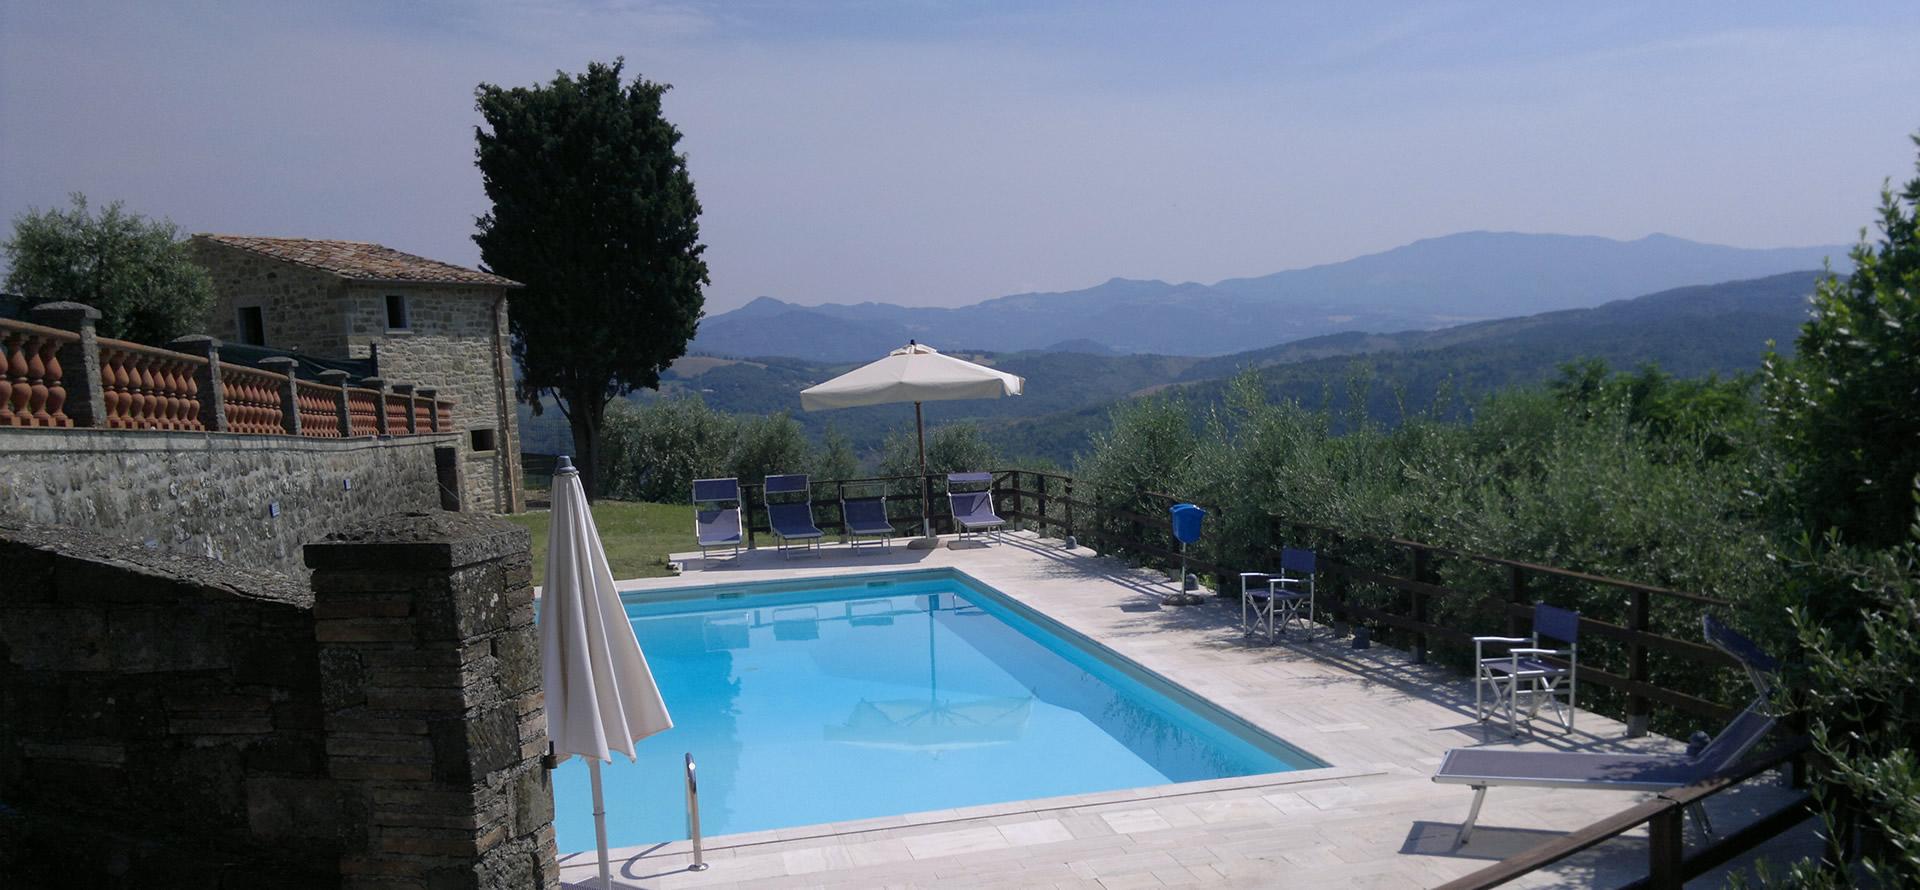 Piscina panoramica Valtiberina Toscana